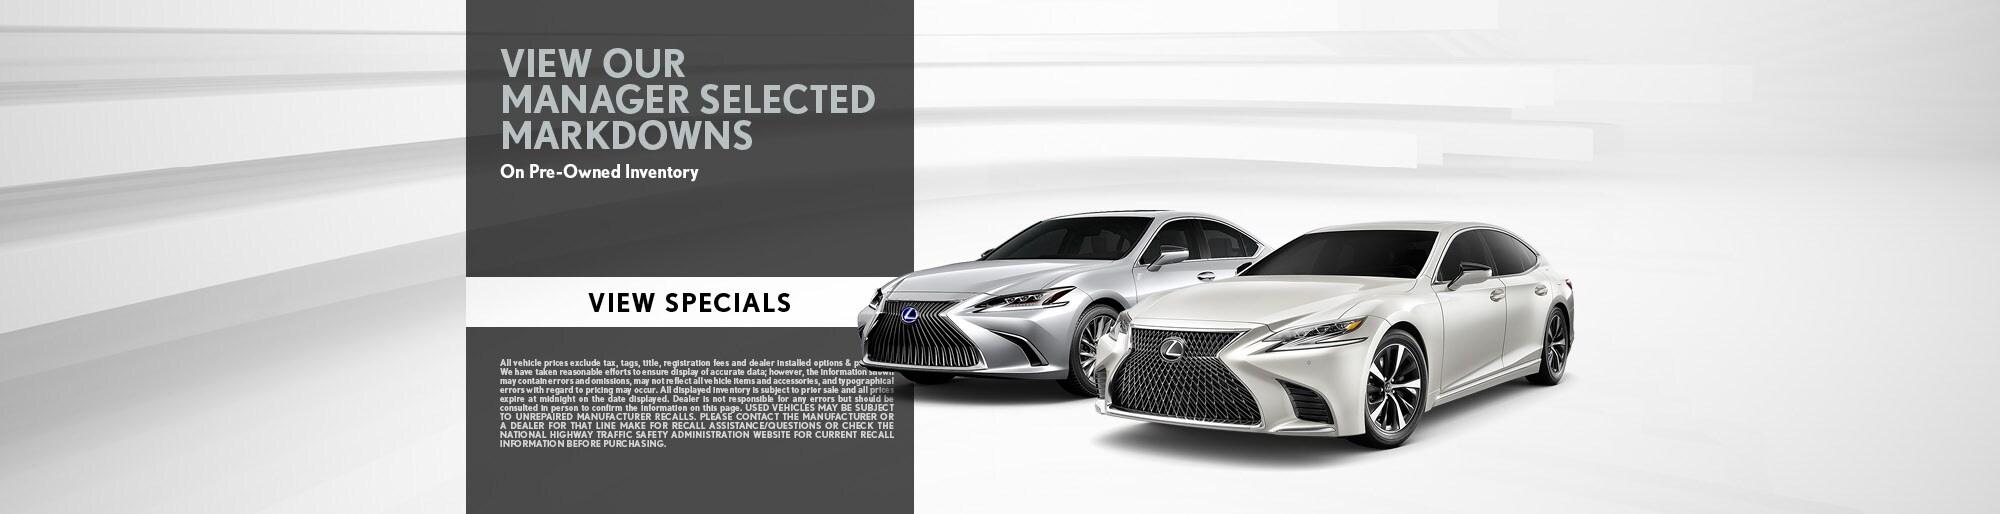 Lexus Of Birmingham 1 Luxury Dealer In Alabama